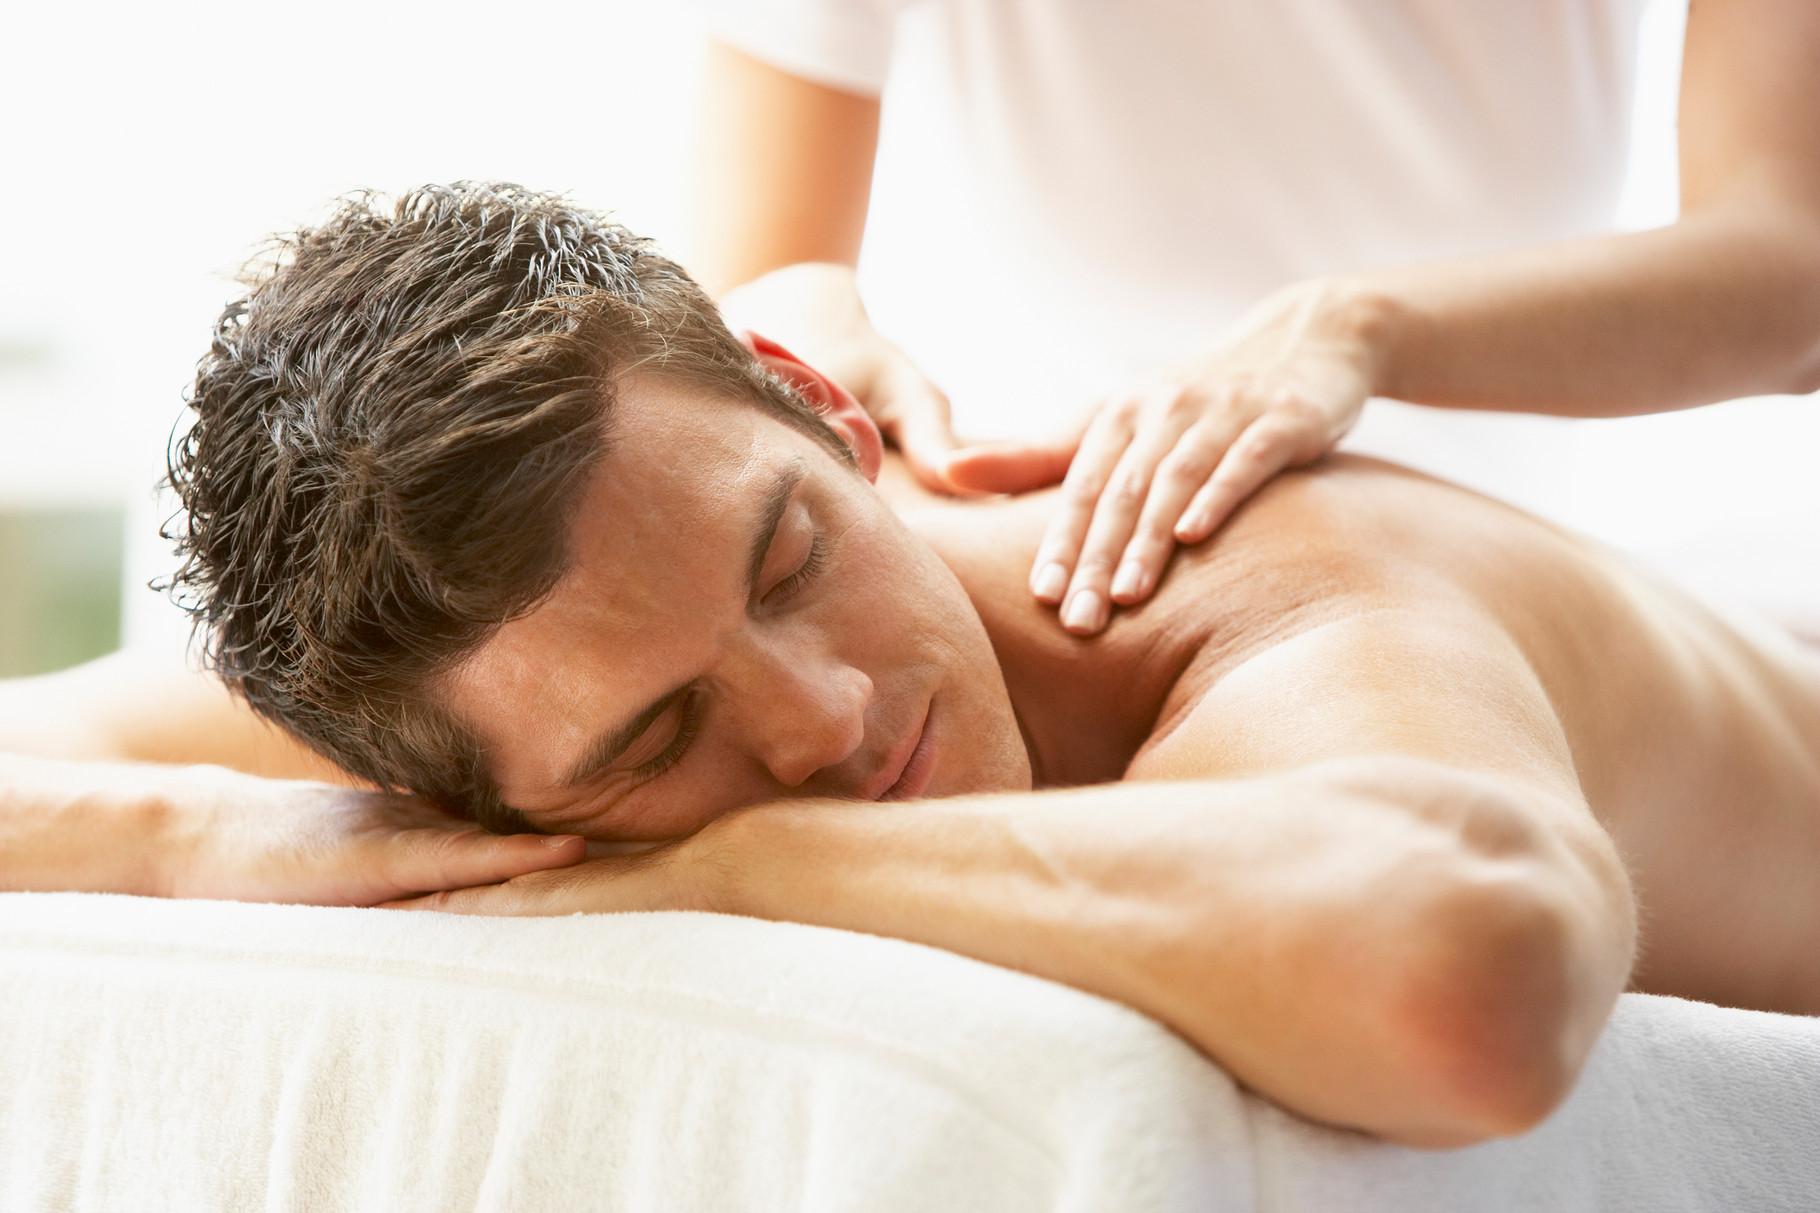 orinar durante un masaje de próstata